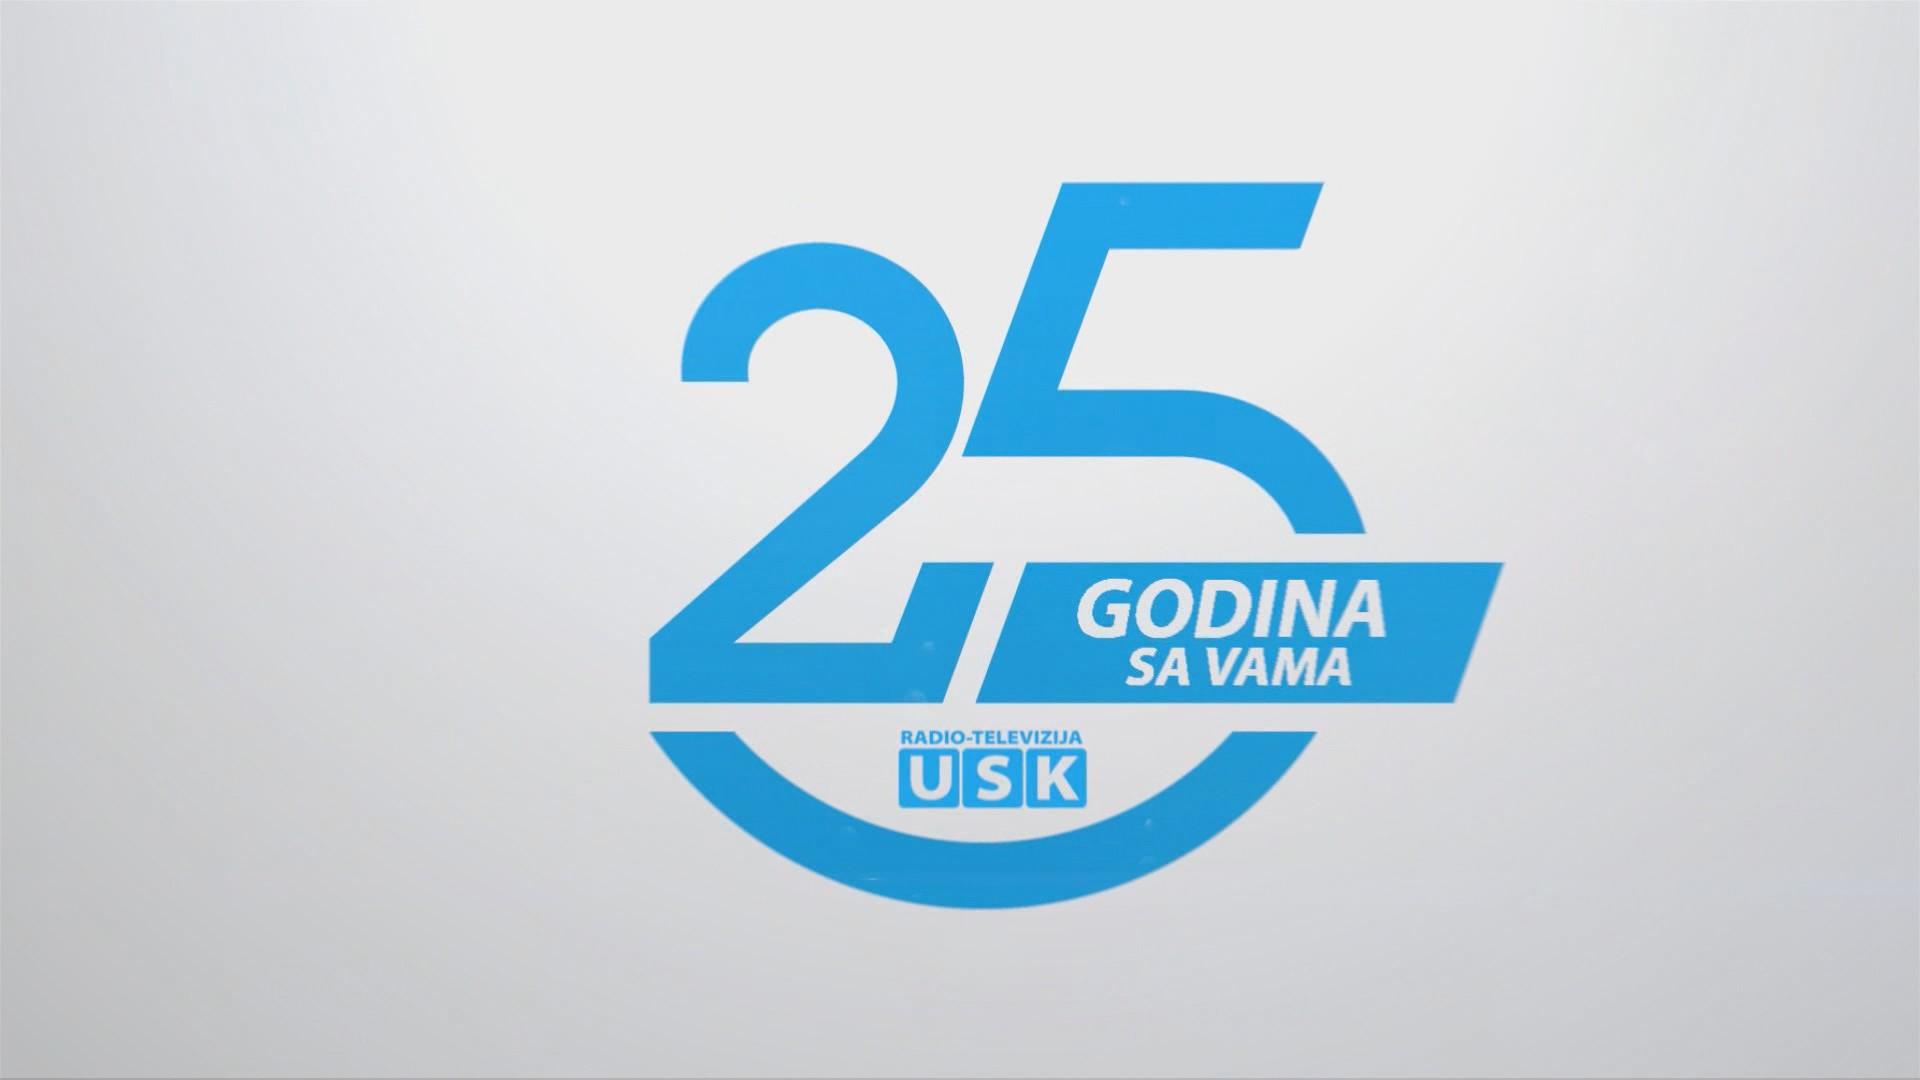 RTV USK 25 GODINA SA VAMA